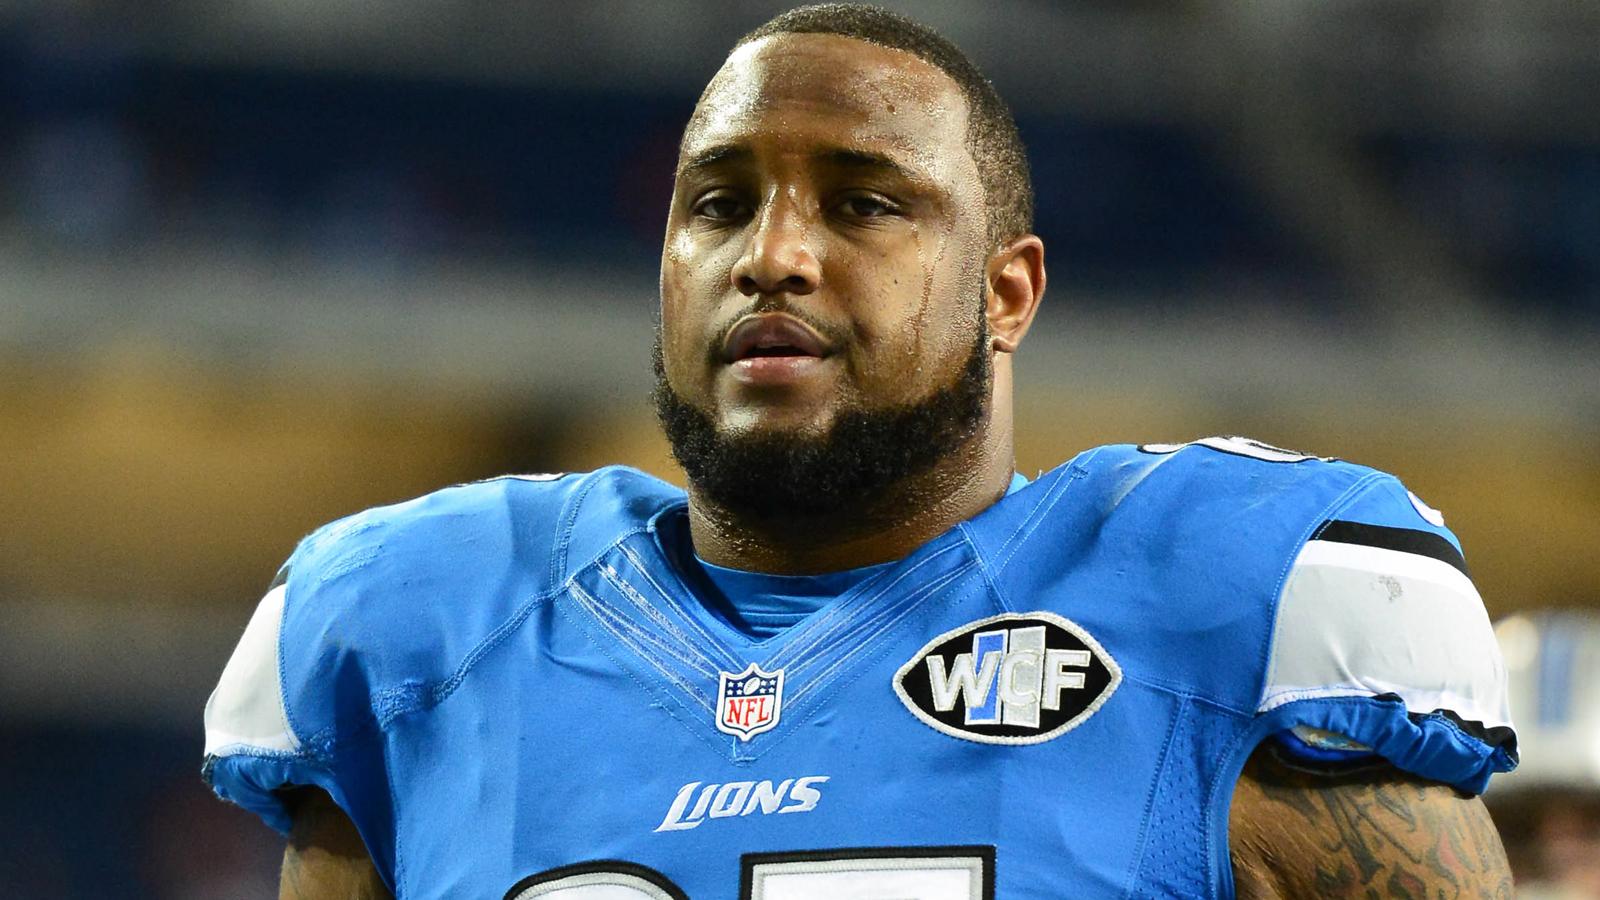 Former Lions offensive lineman Sims announces retirement